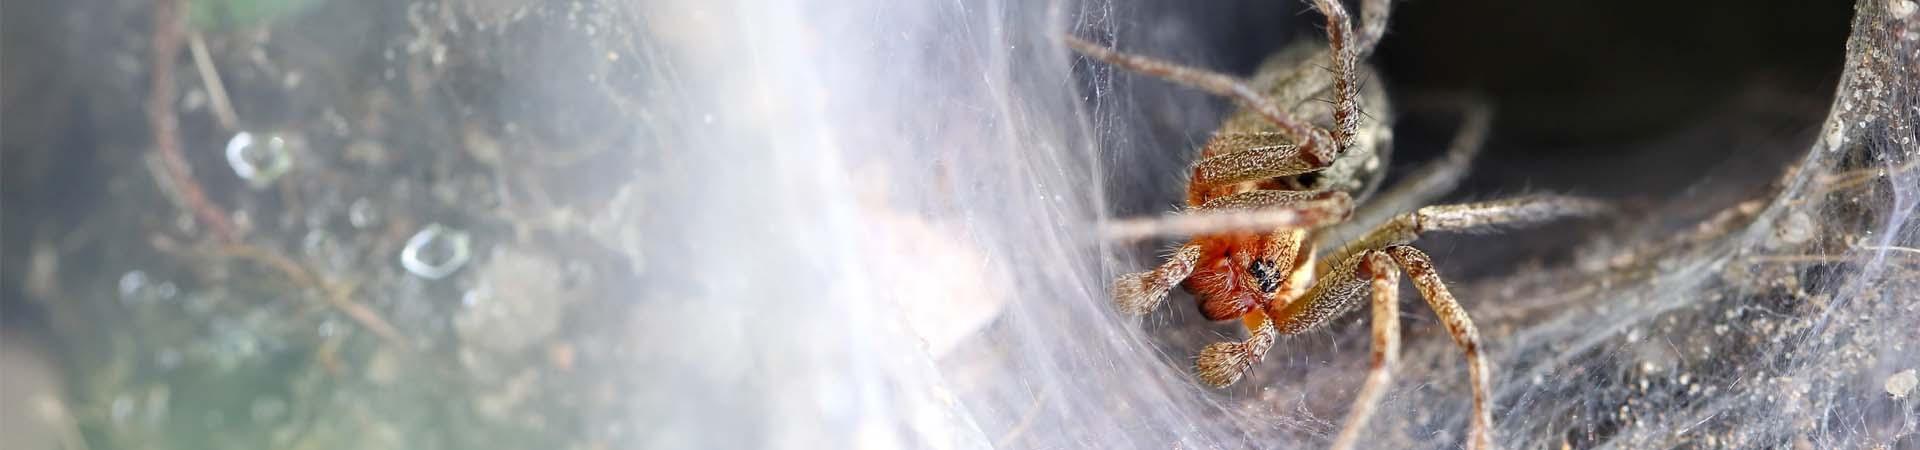 mainslide_spiders1